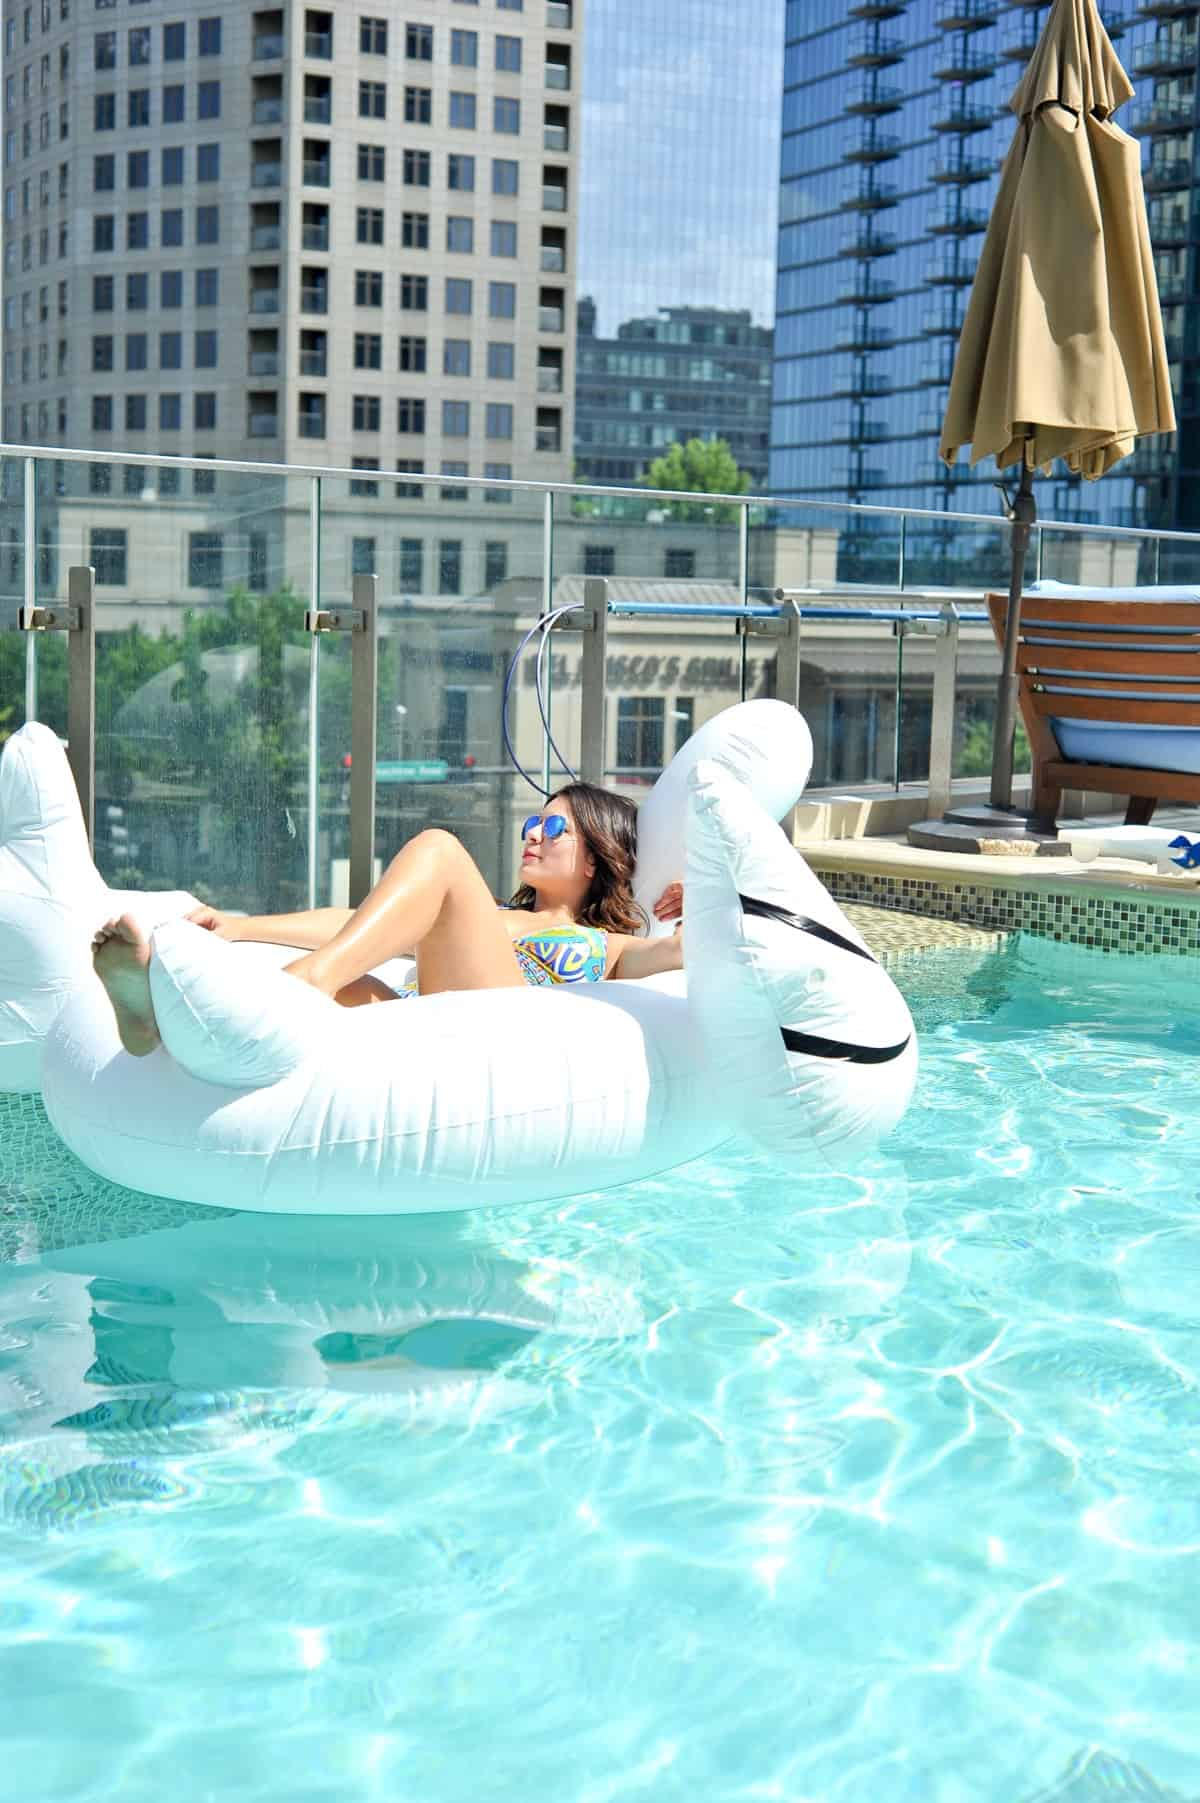 adult pool party ideas, swan pool float, flamingo inflatable drink holder via @mystylevita - 27